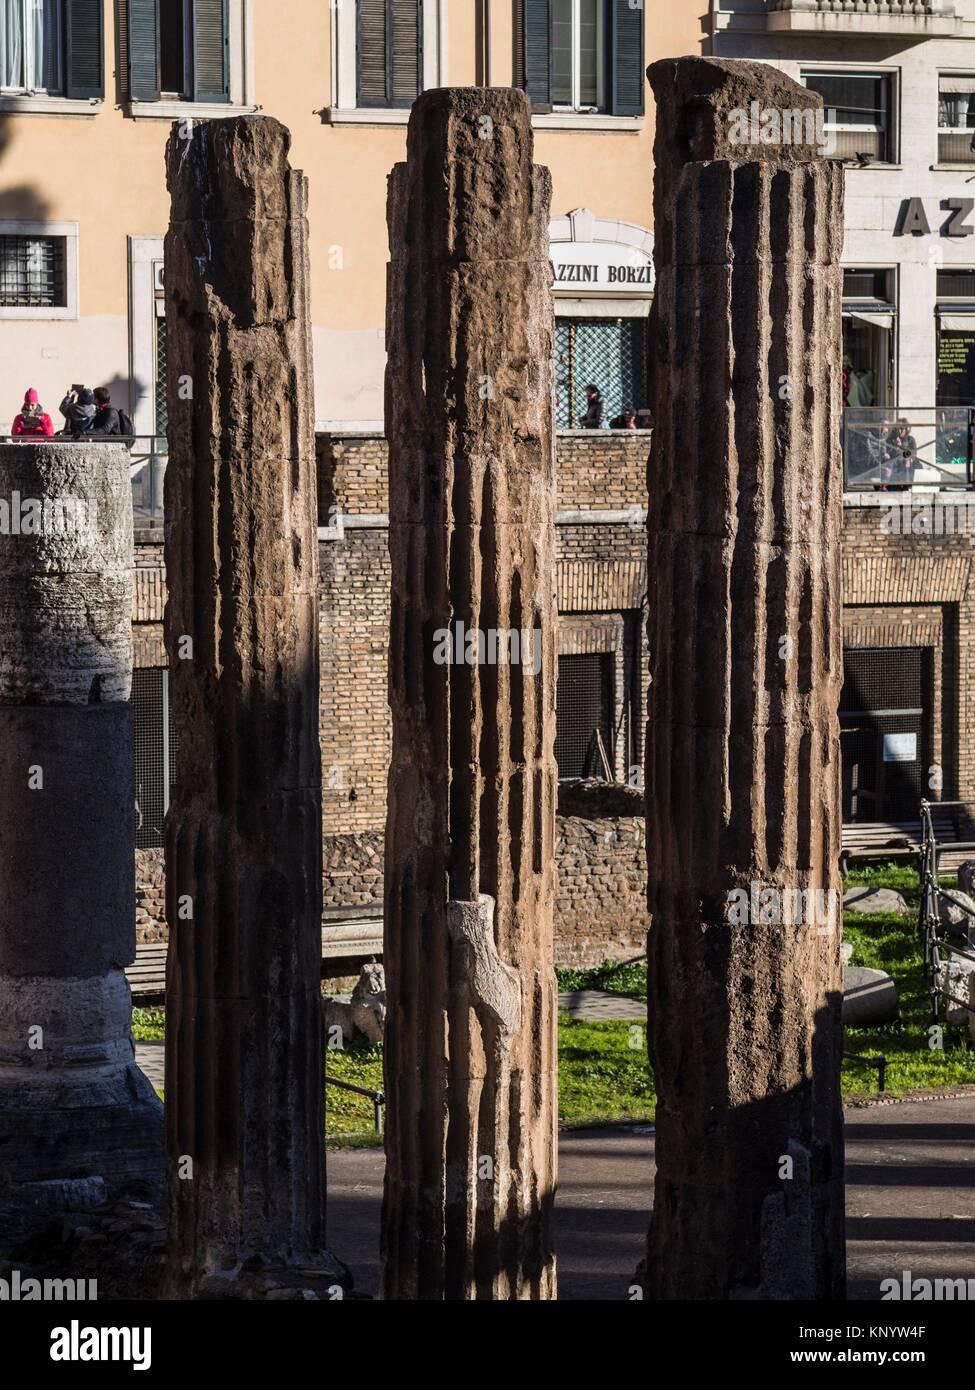 Area Sacra di Largo Argentina, Rome, Italy - Stock Image